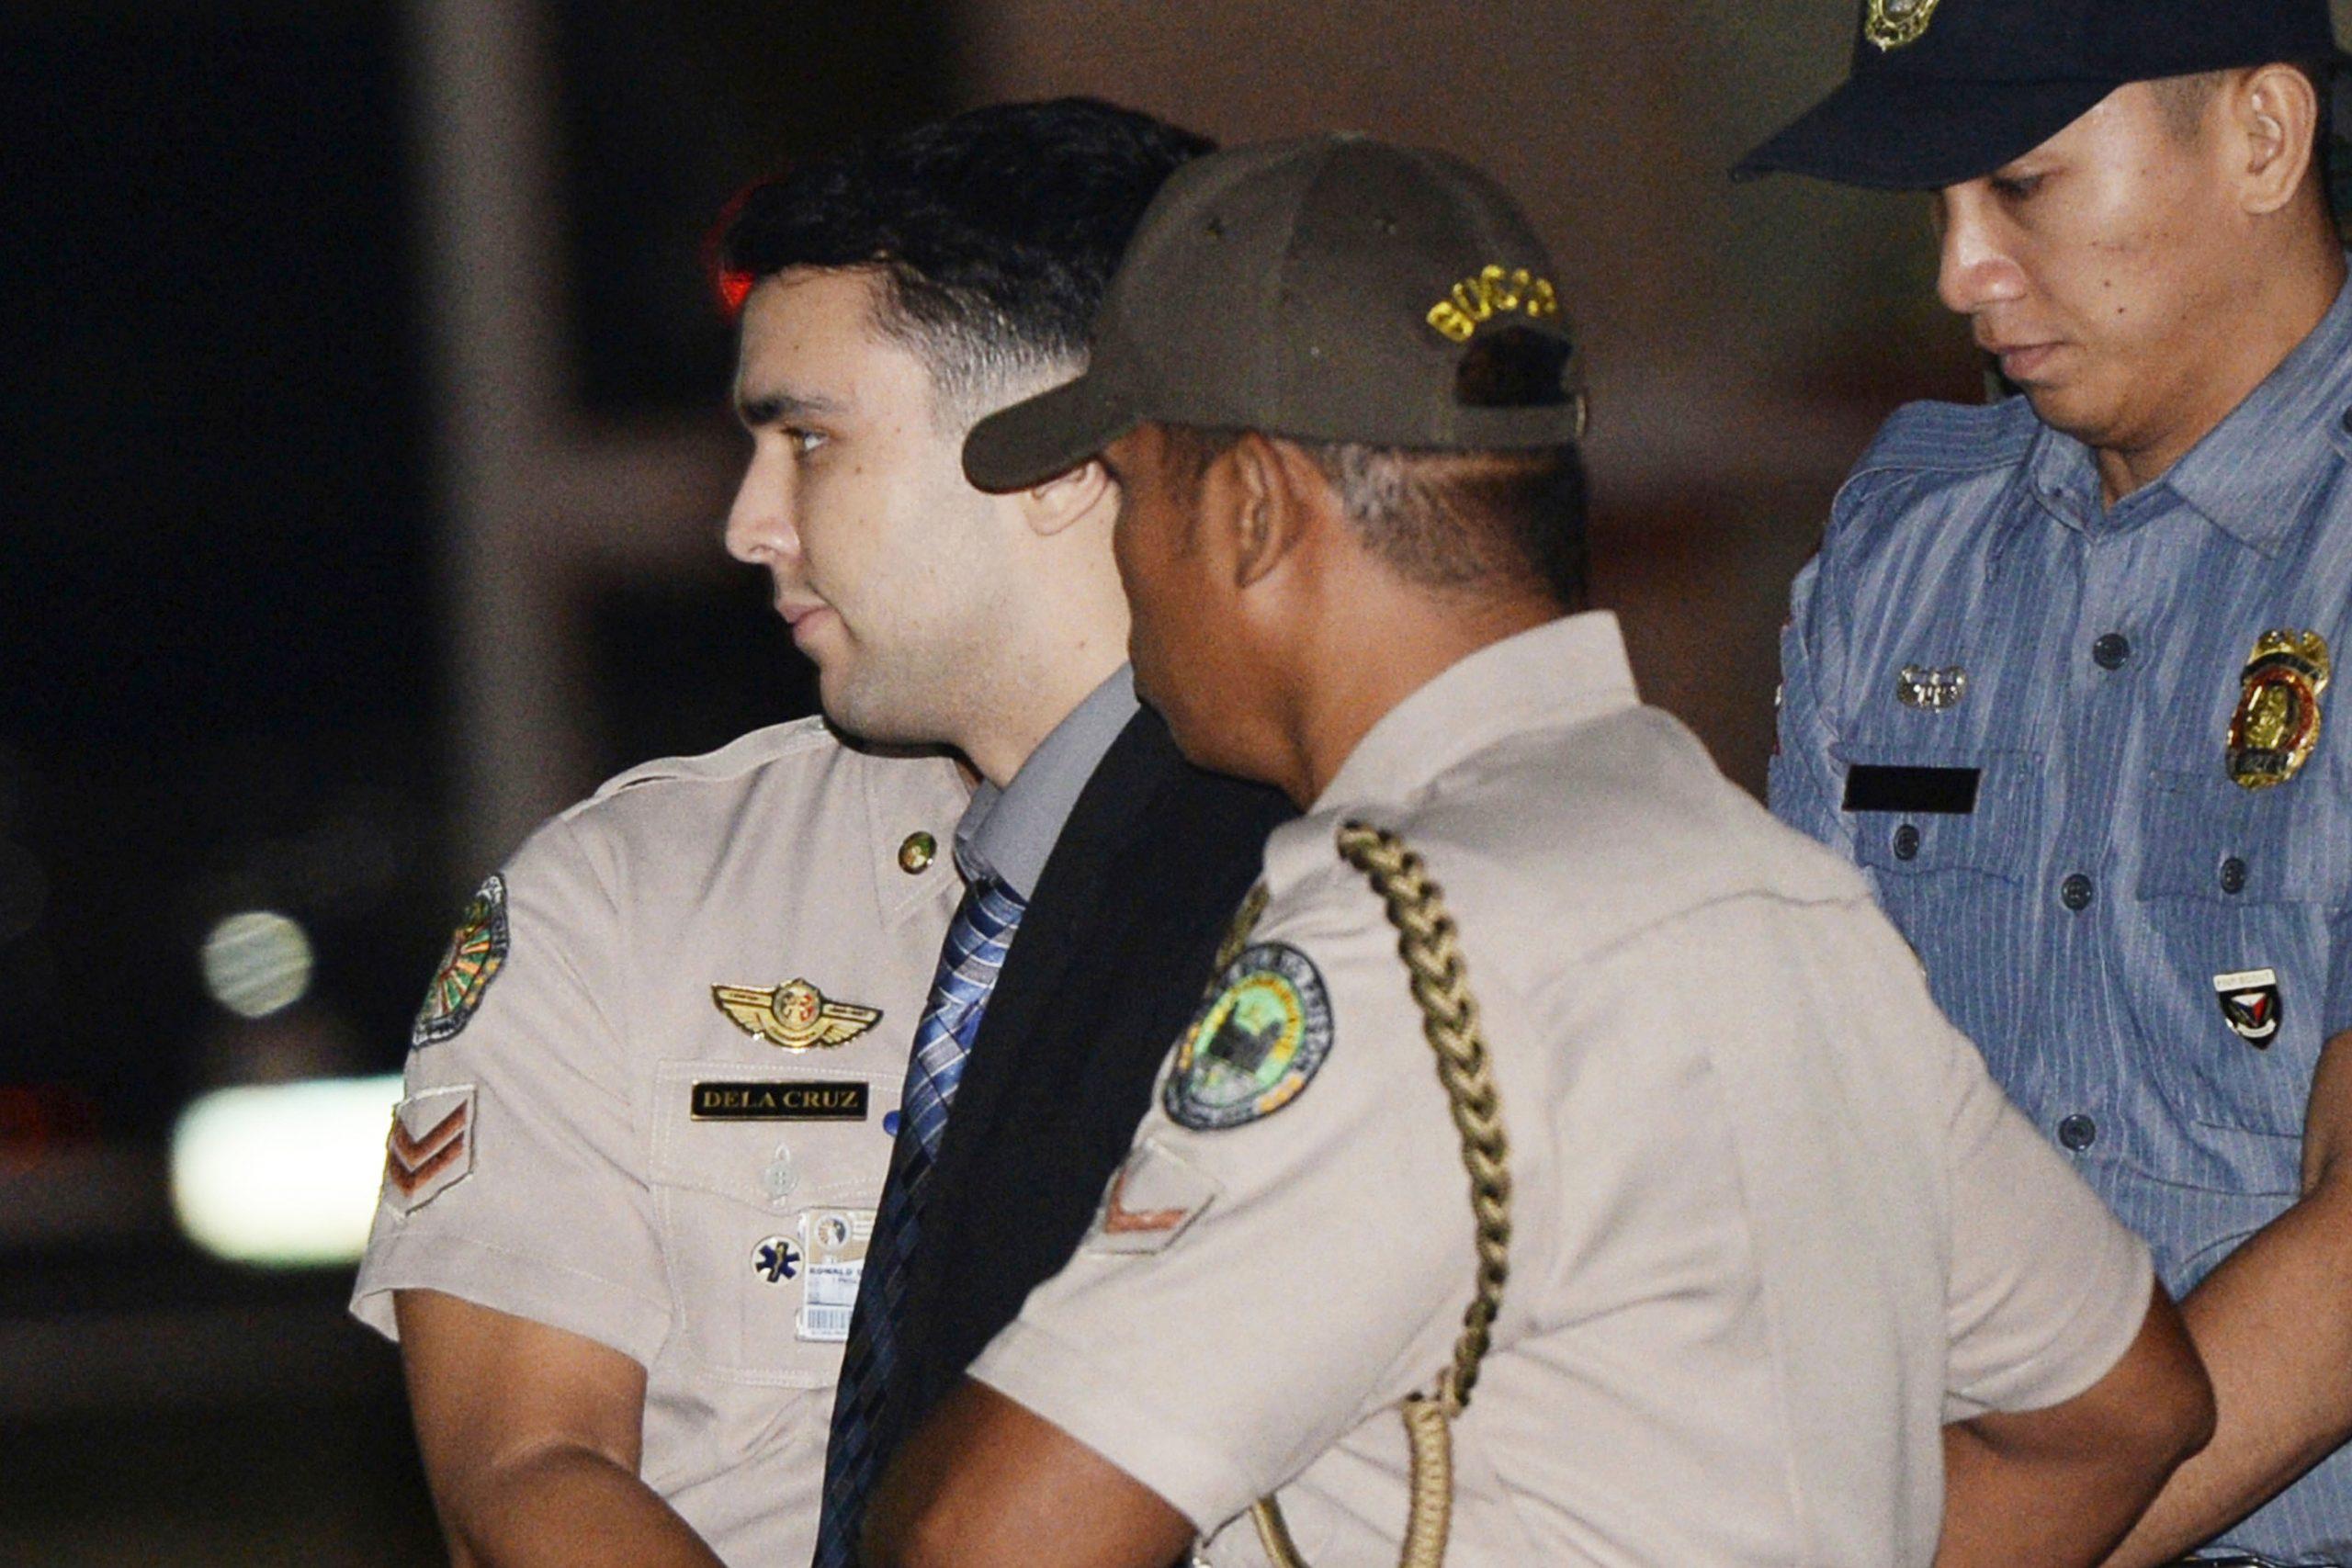 Philippine President Grazia US Navy in 2014 killing of transgender woman Jennifer Laude